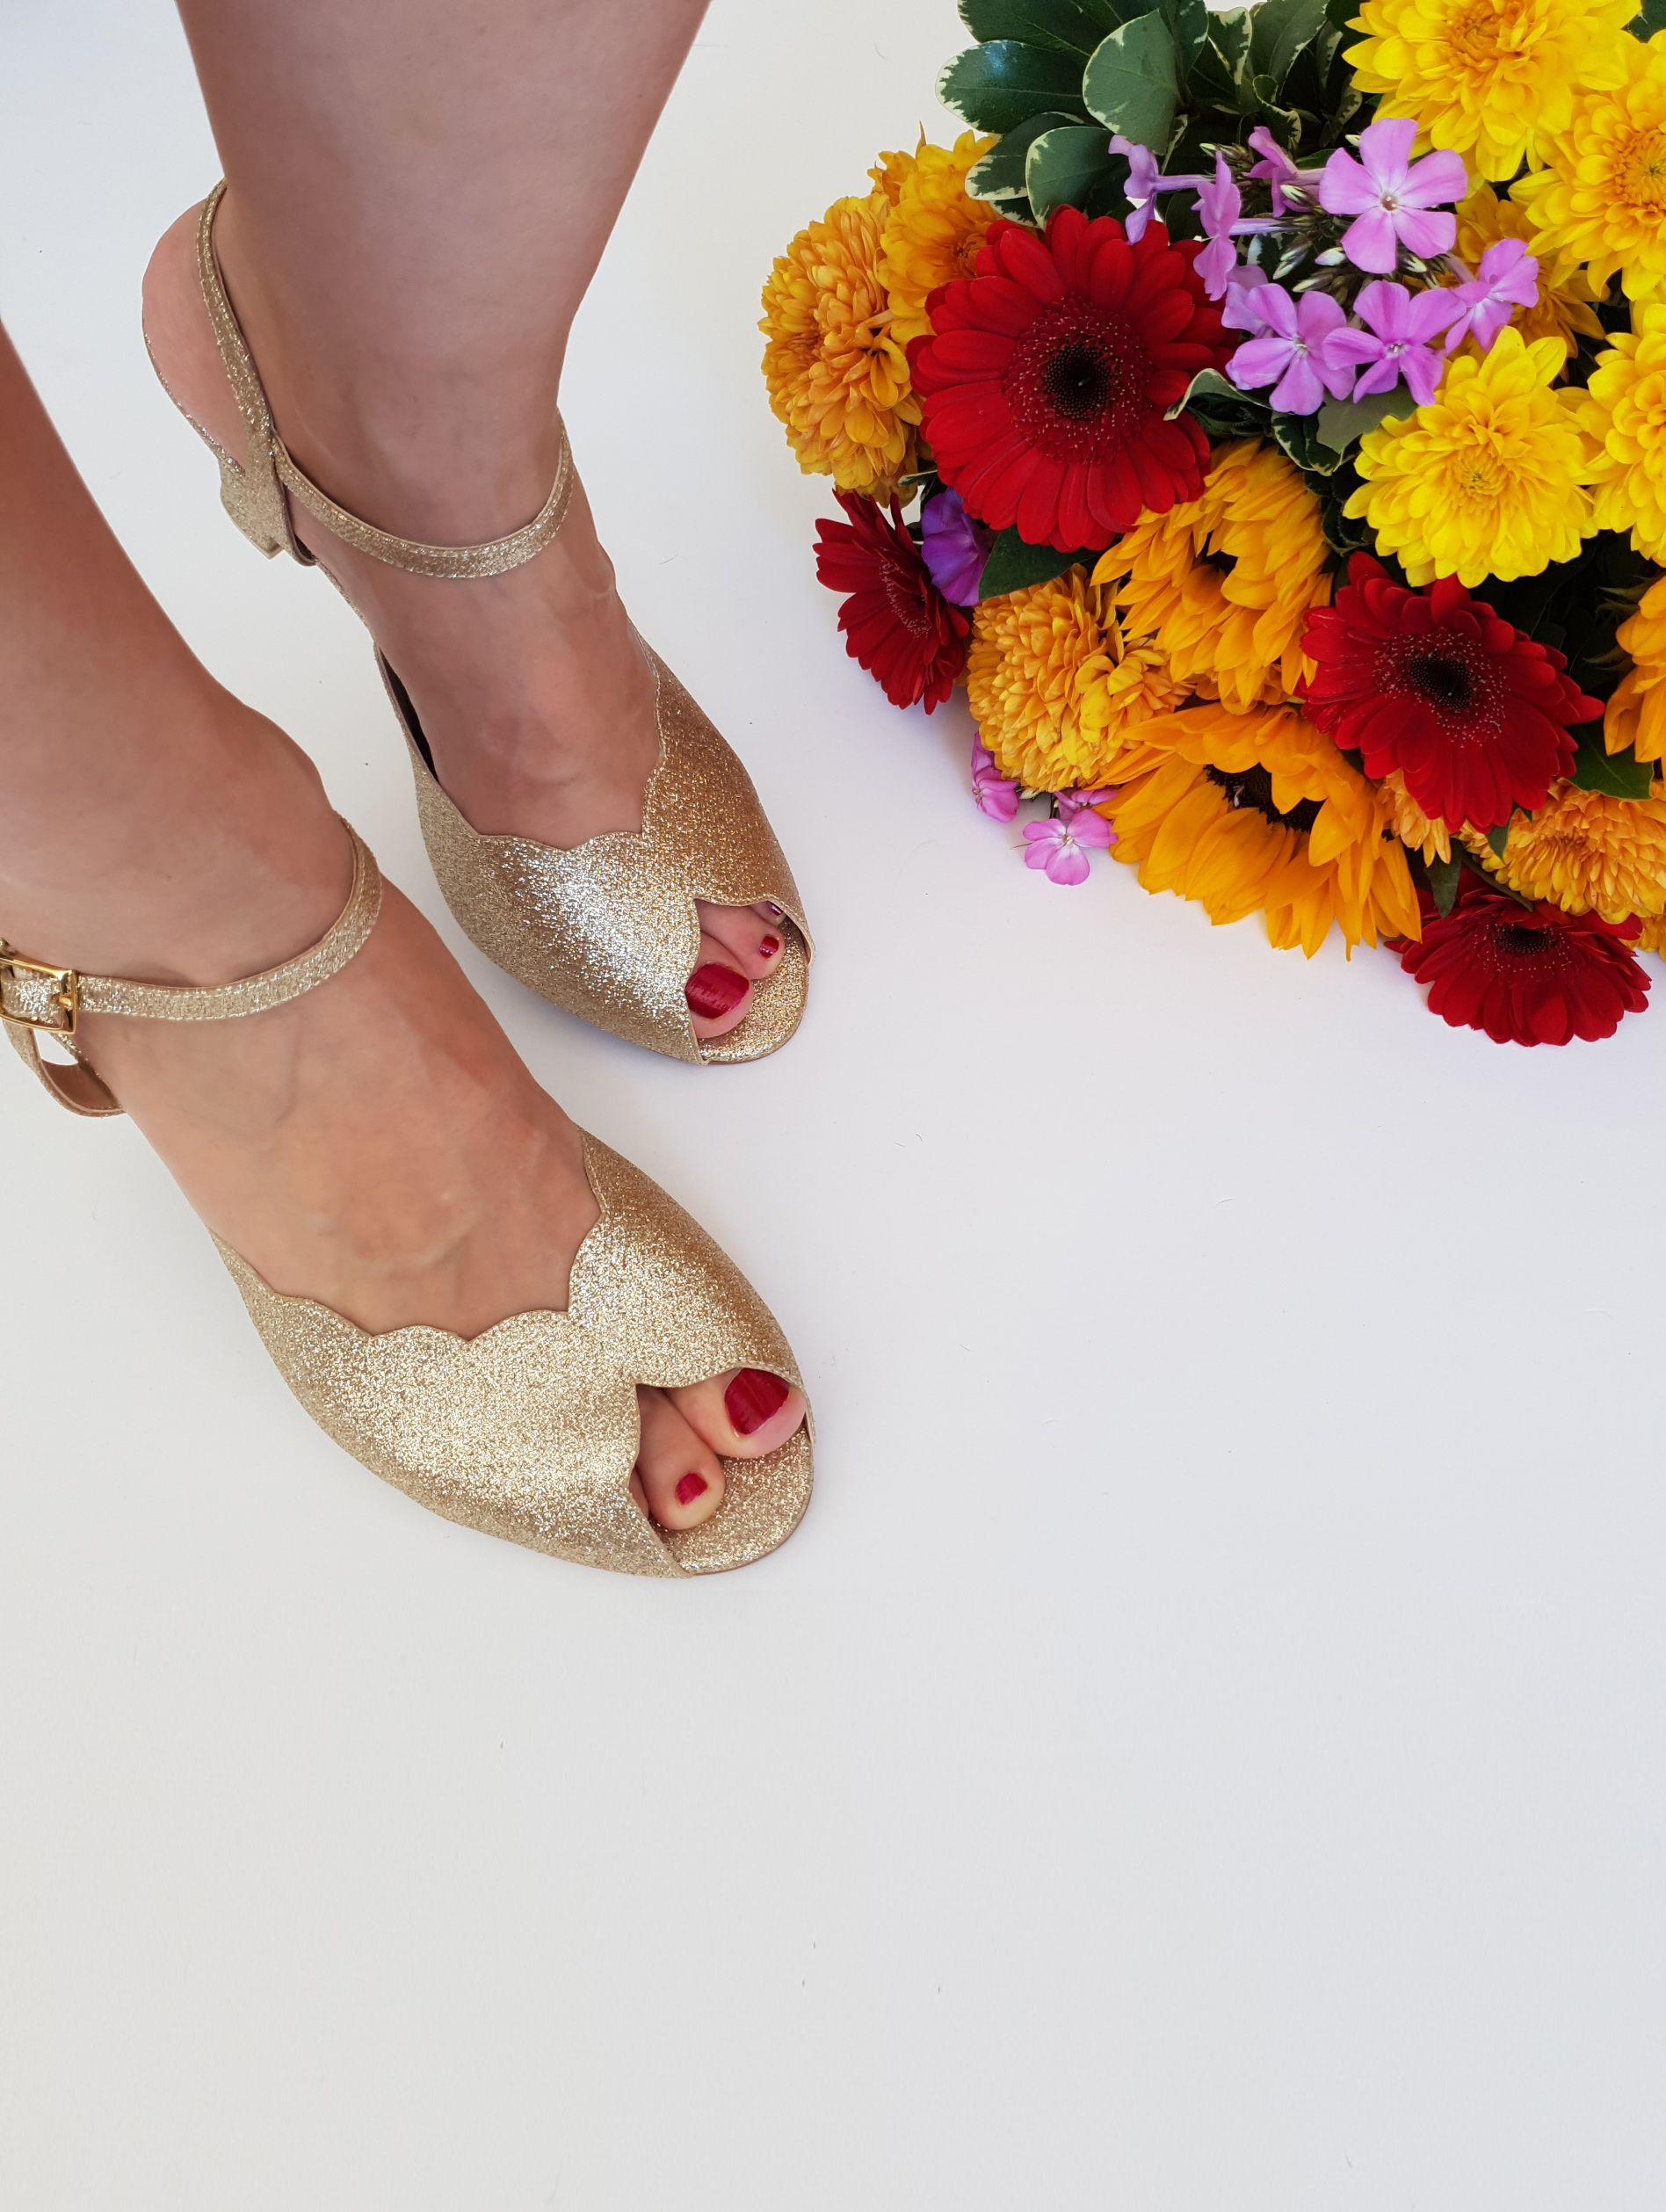 cca0636cc4197 Adina Vegan Bridal Shoes, Sparkly Gold High Heel Wedding Sandal with ...